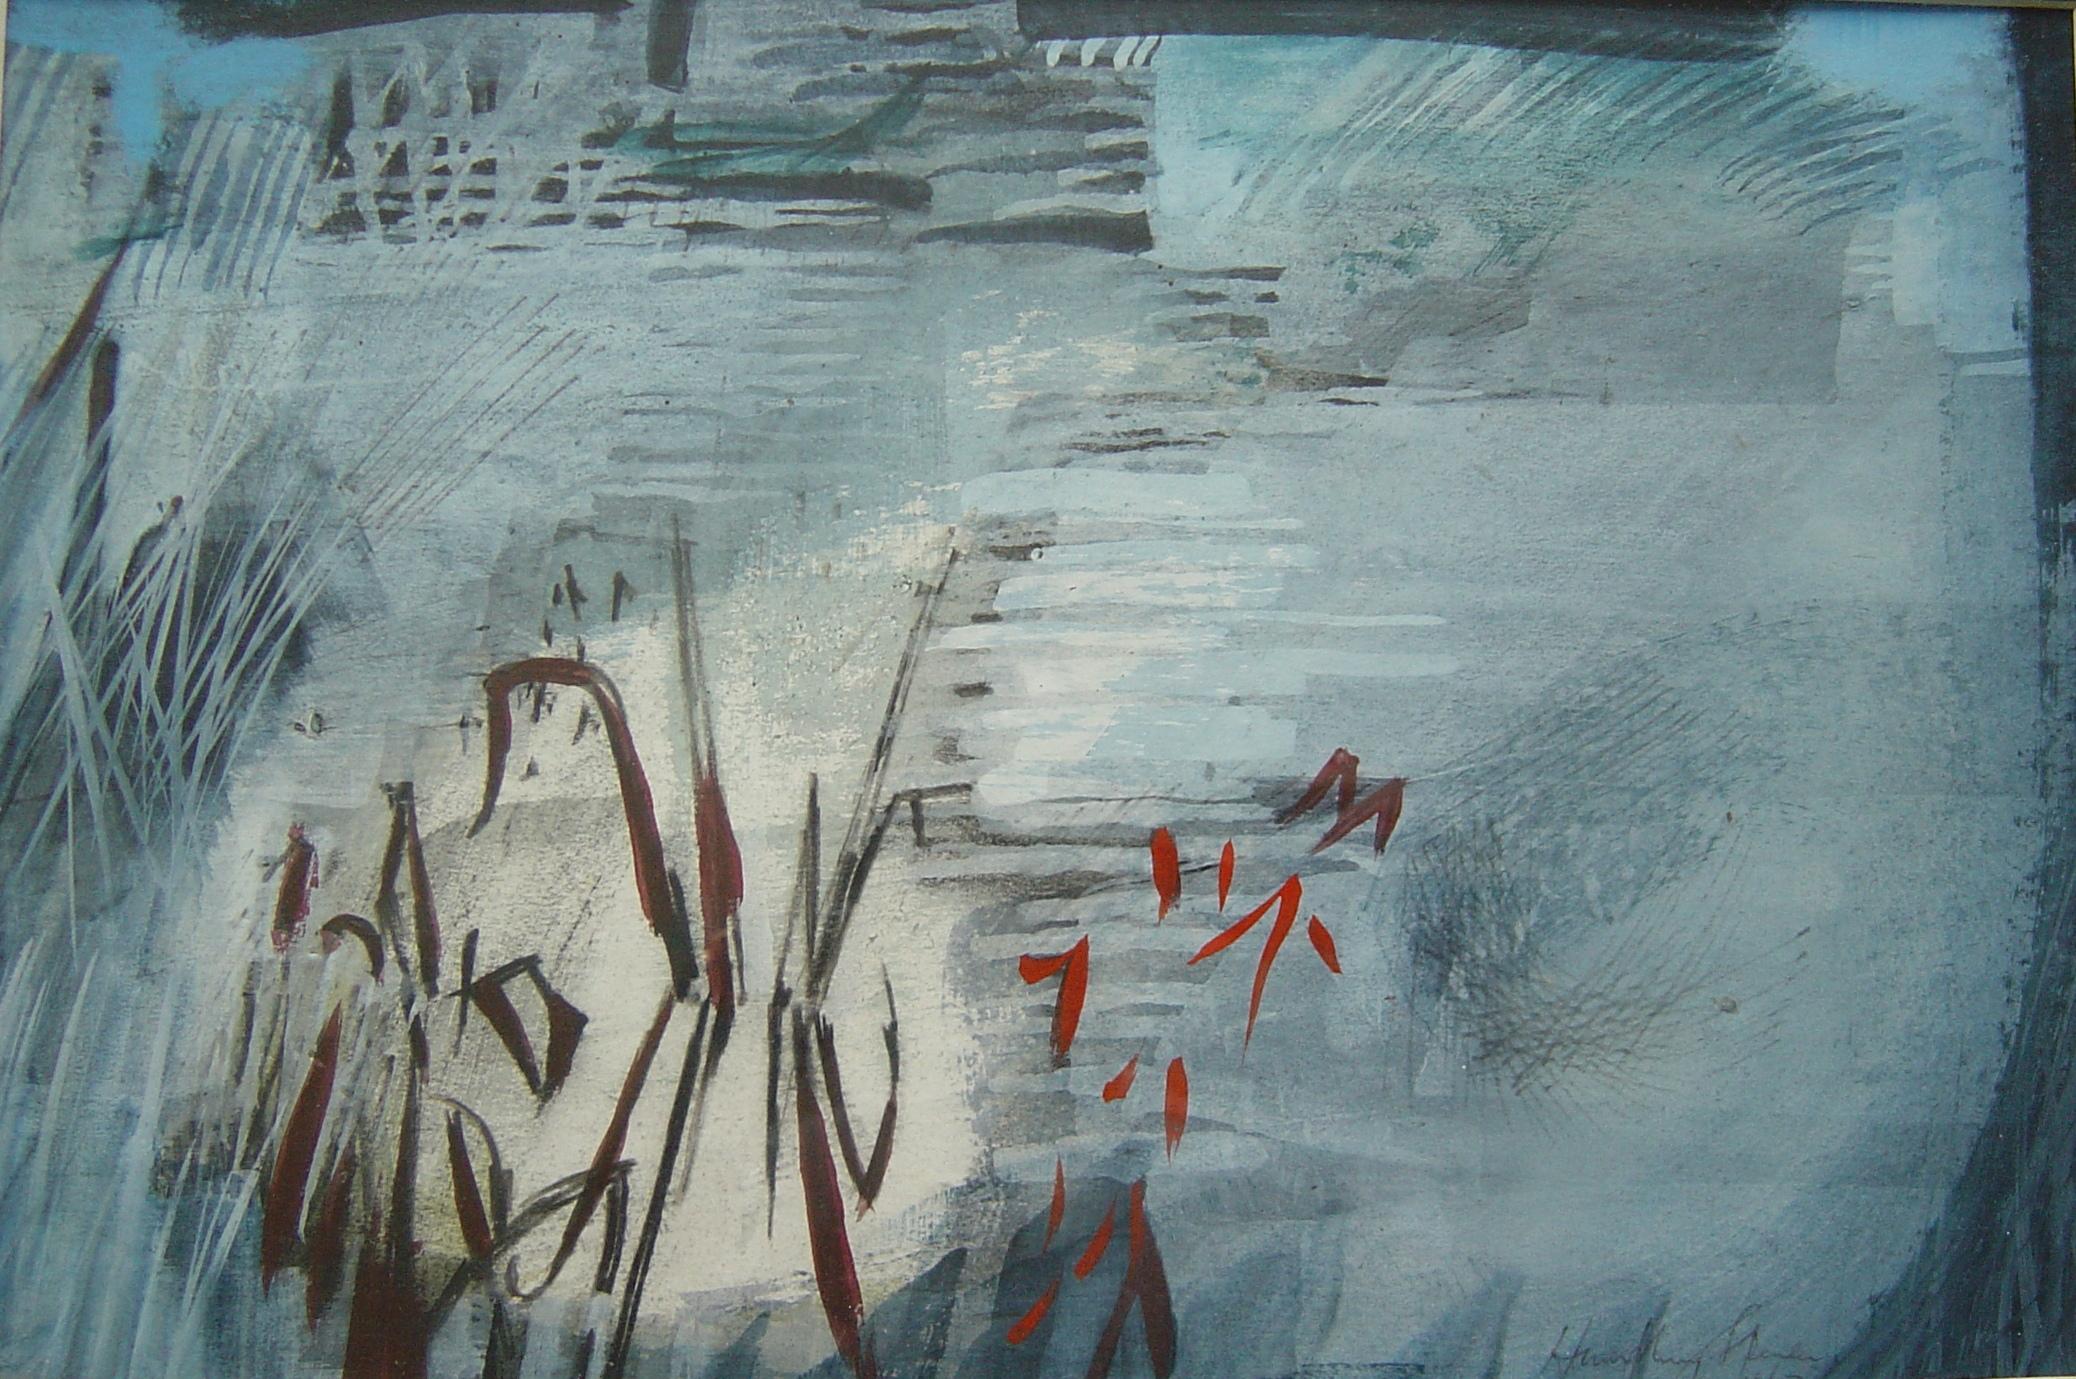 Humphrey Spender - Reeds in Water